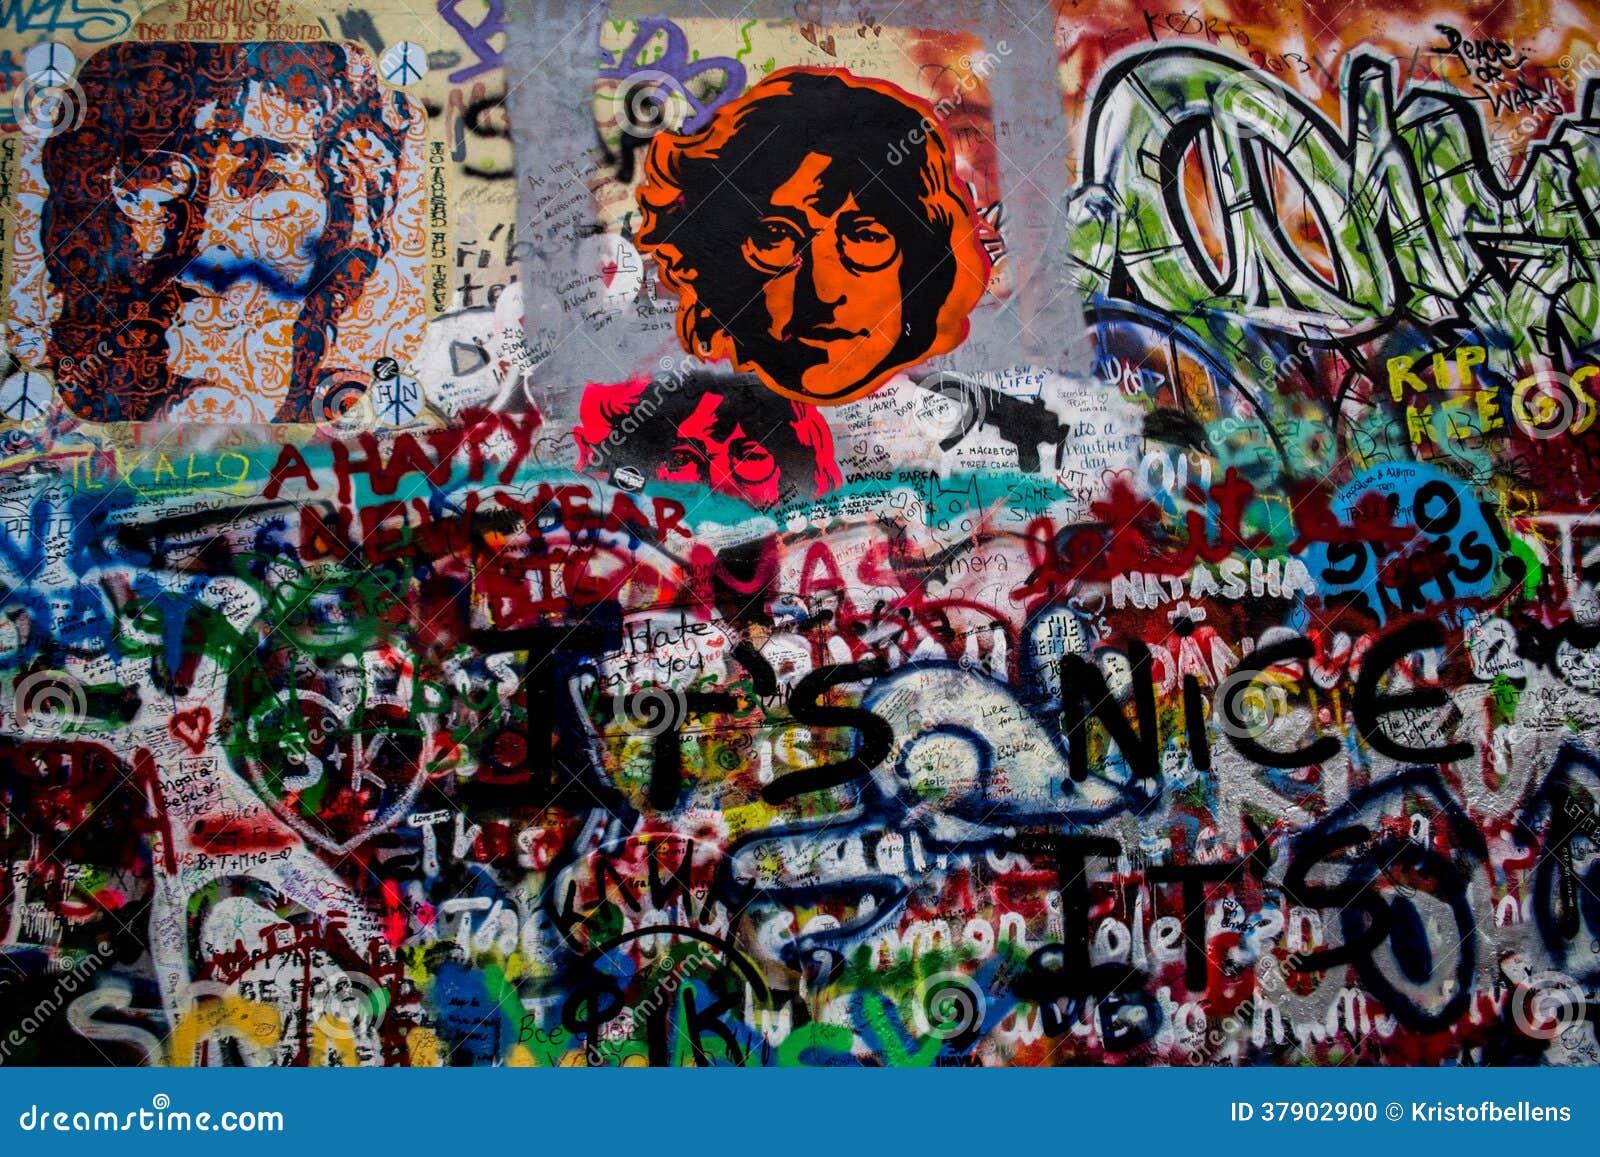 graffiti spray paint art wallpaper